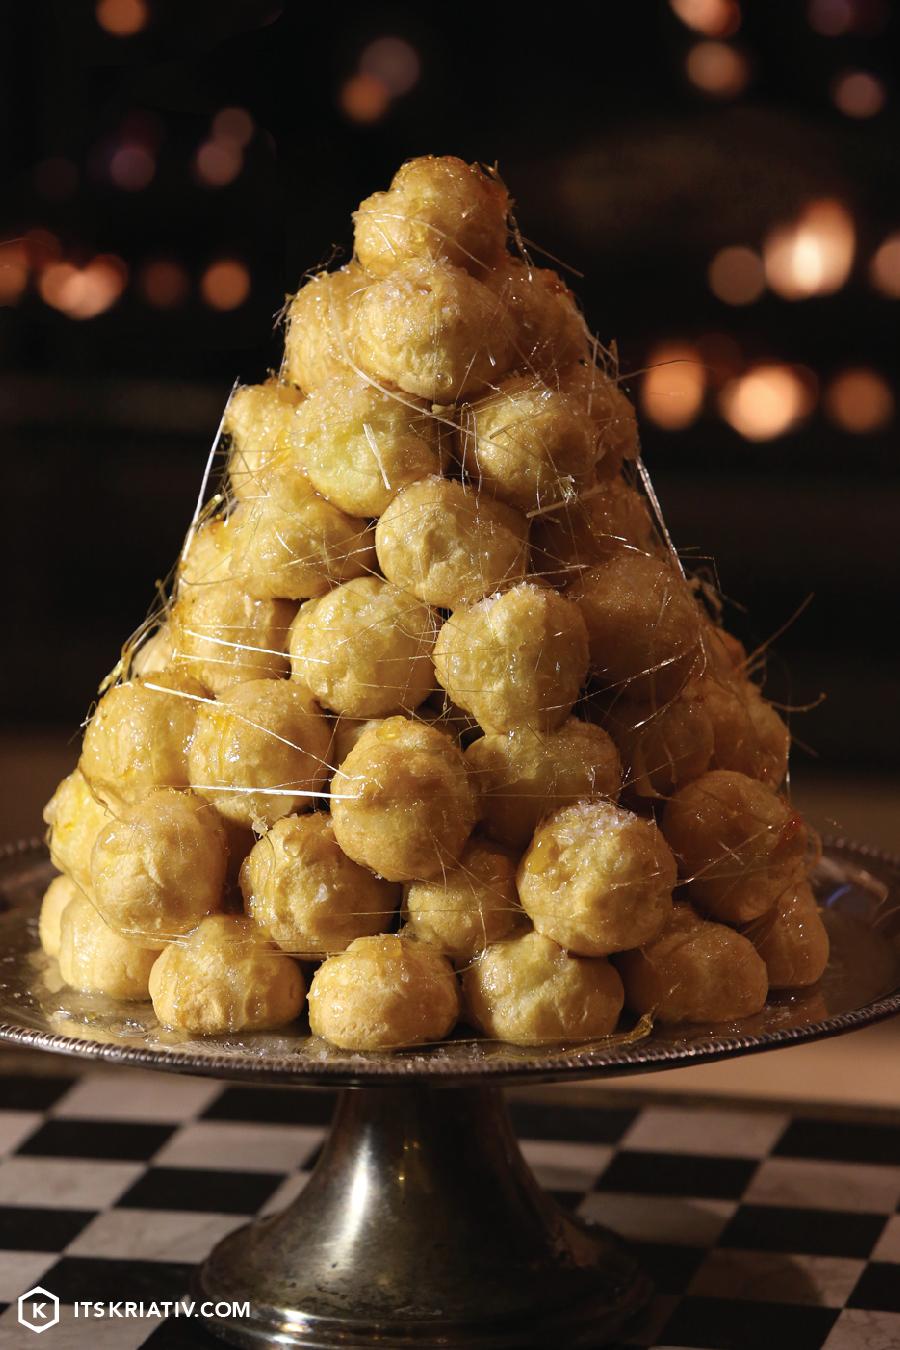 Its-Kriativ-Food-Holiday-Croquembouche-Cake-Christmas-Tree-Dessert-Sugar.jpg